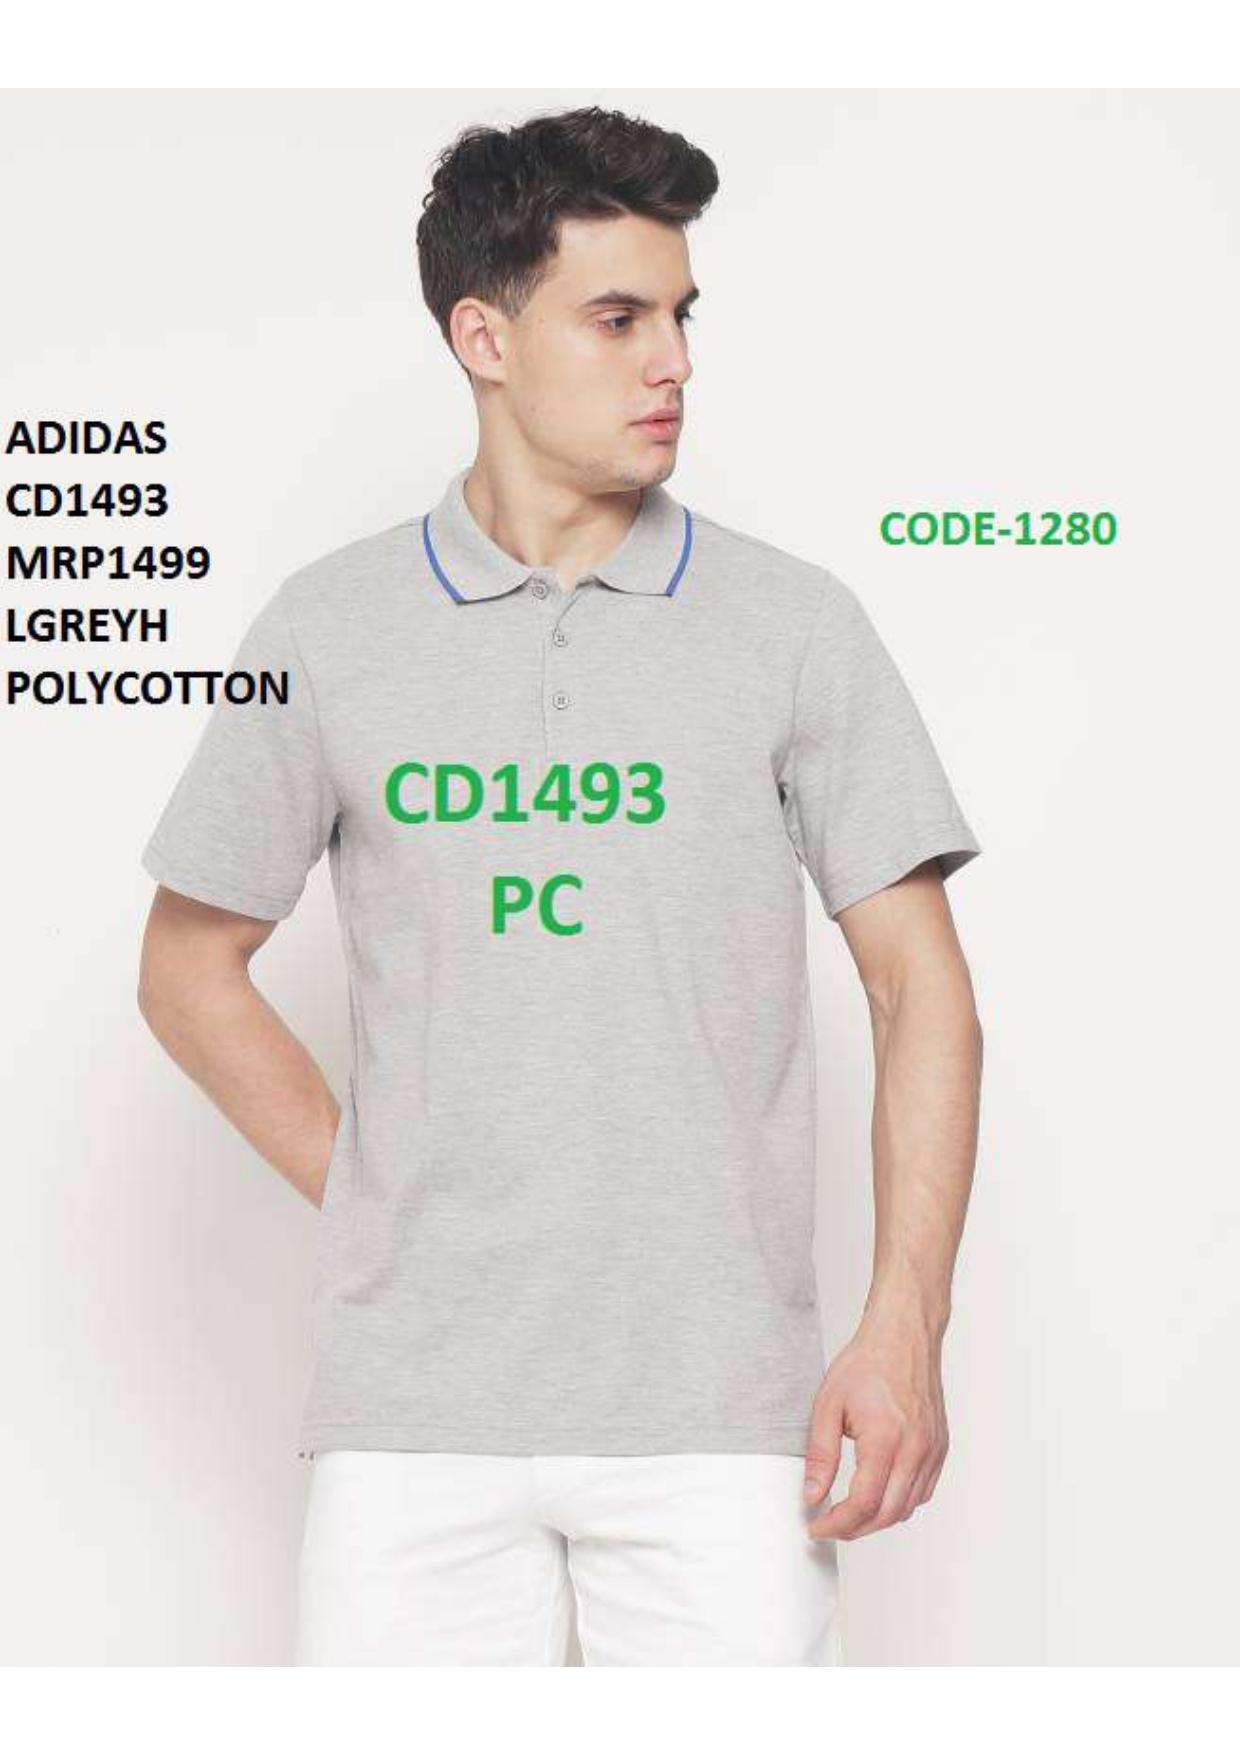 Adidas Black logo T Shirt